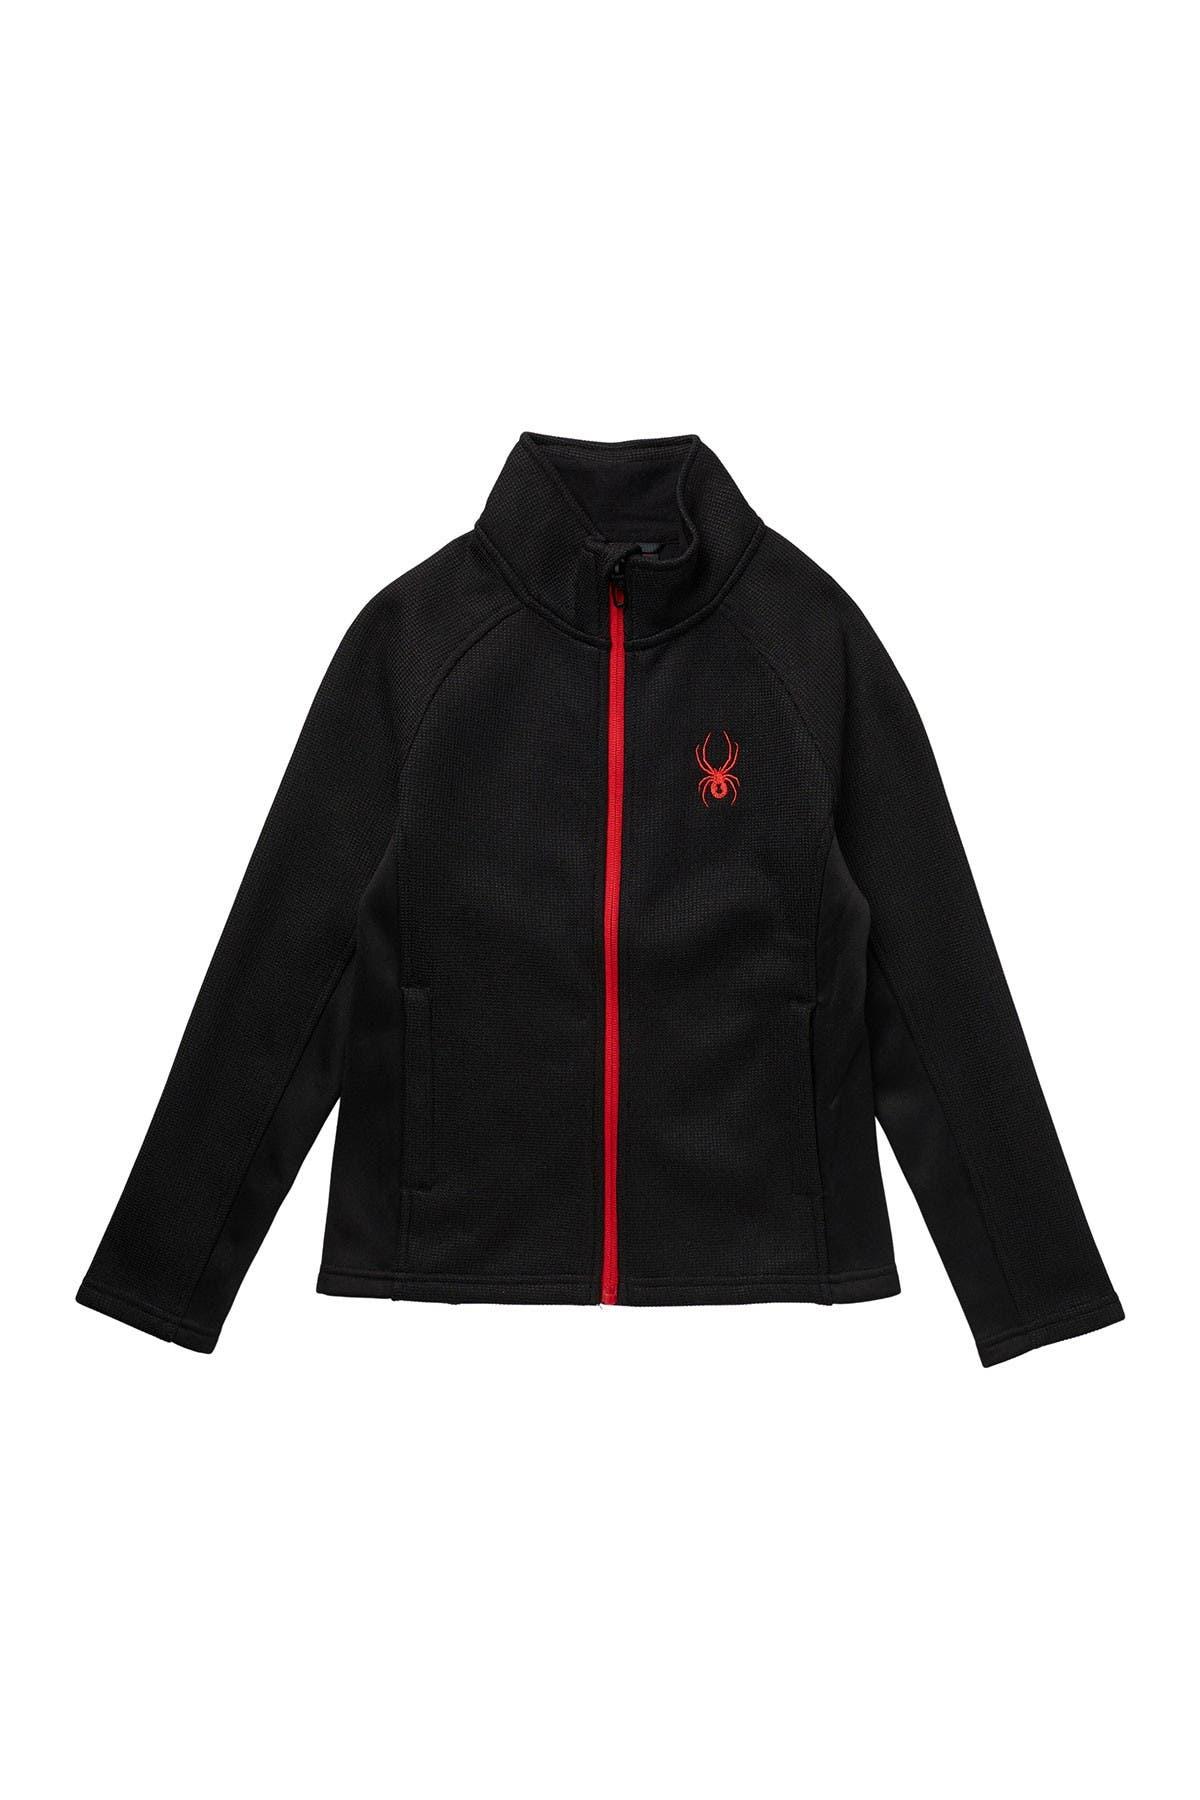 Image of SPYDER Full Zip Spyder Sweater